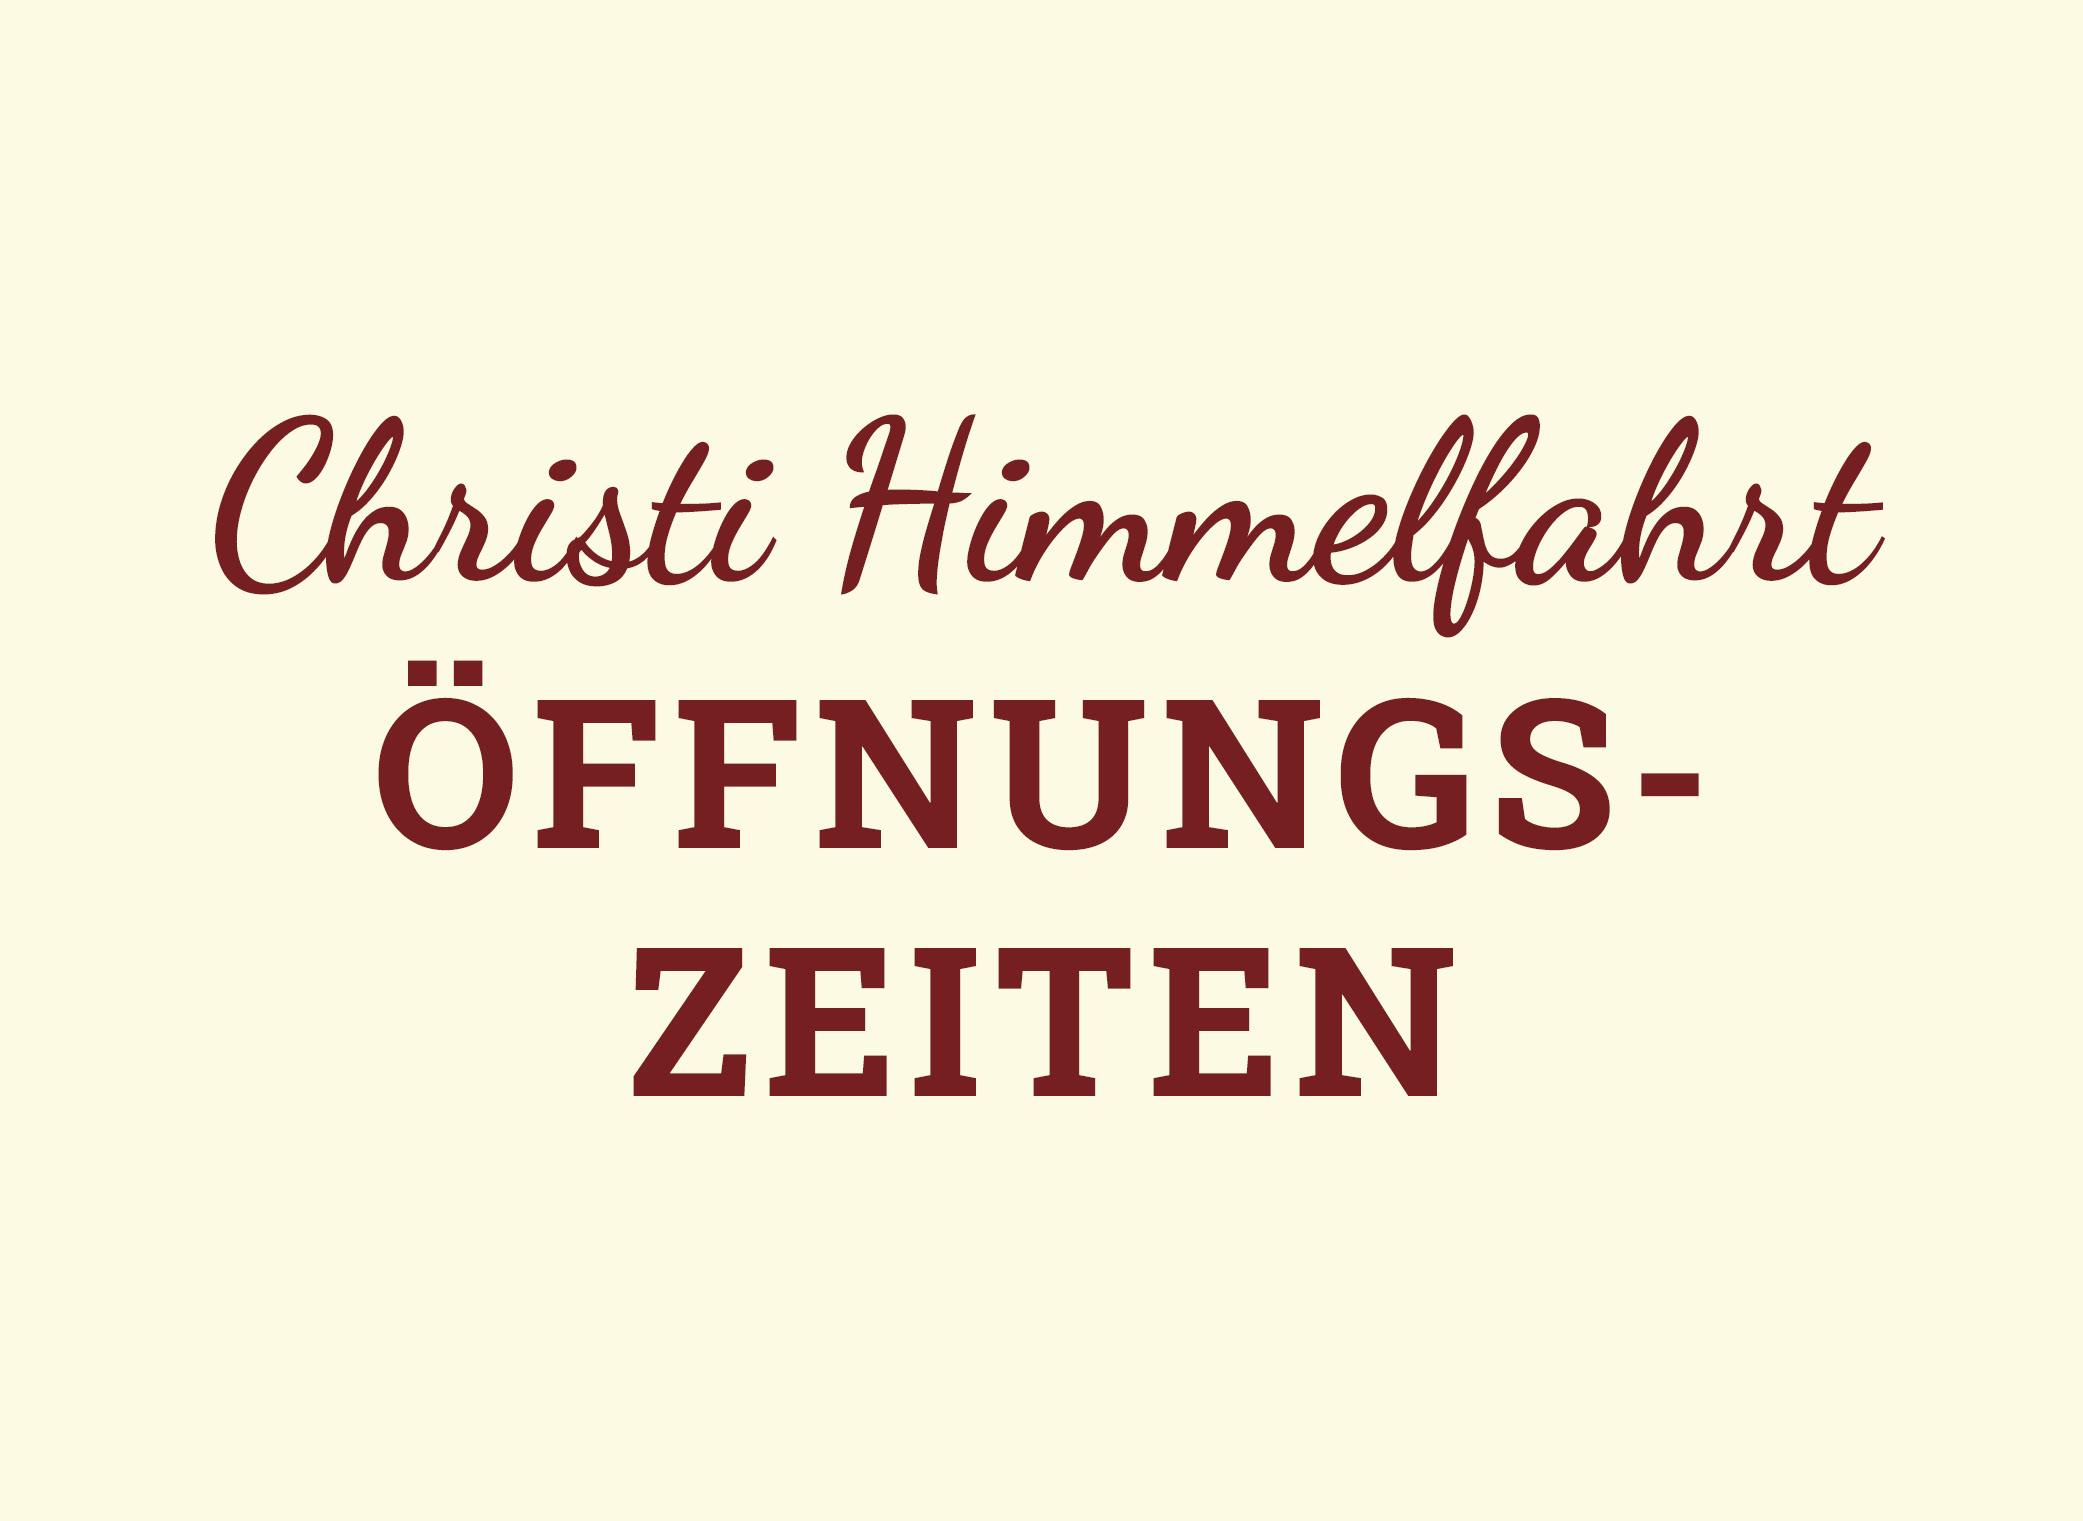 Öffnungszeiten an Christi Himmelfahrt